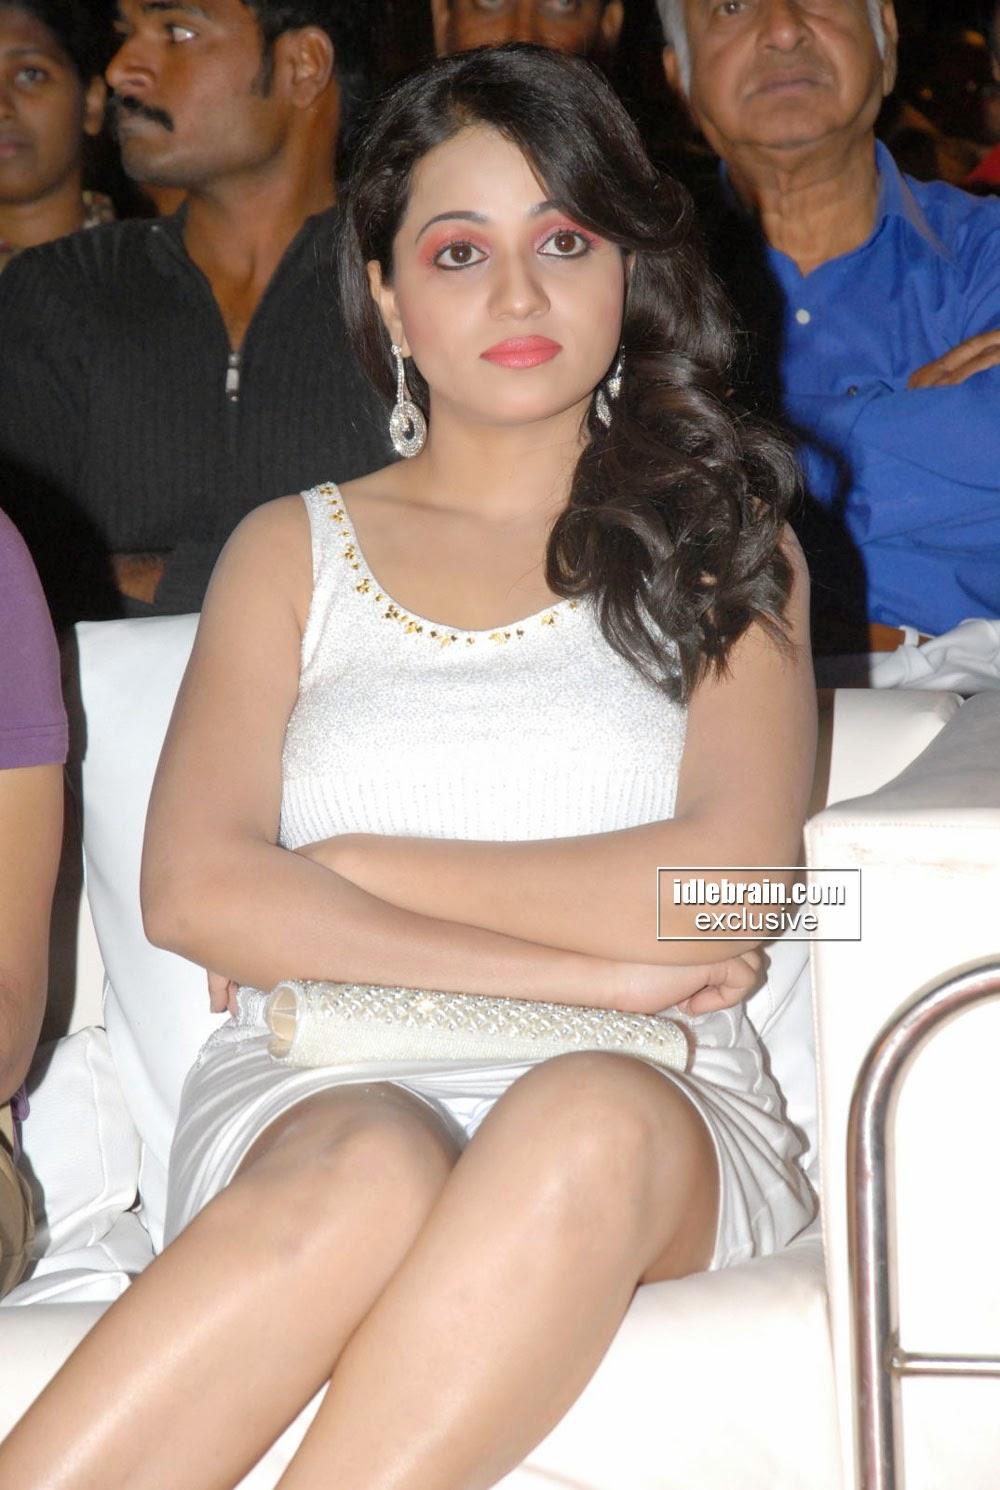 Reshma inner shorts